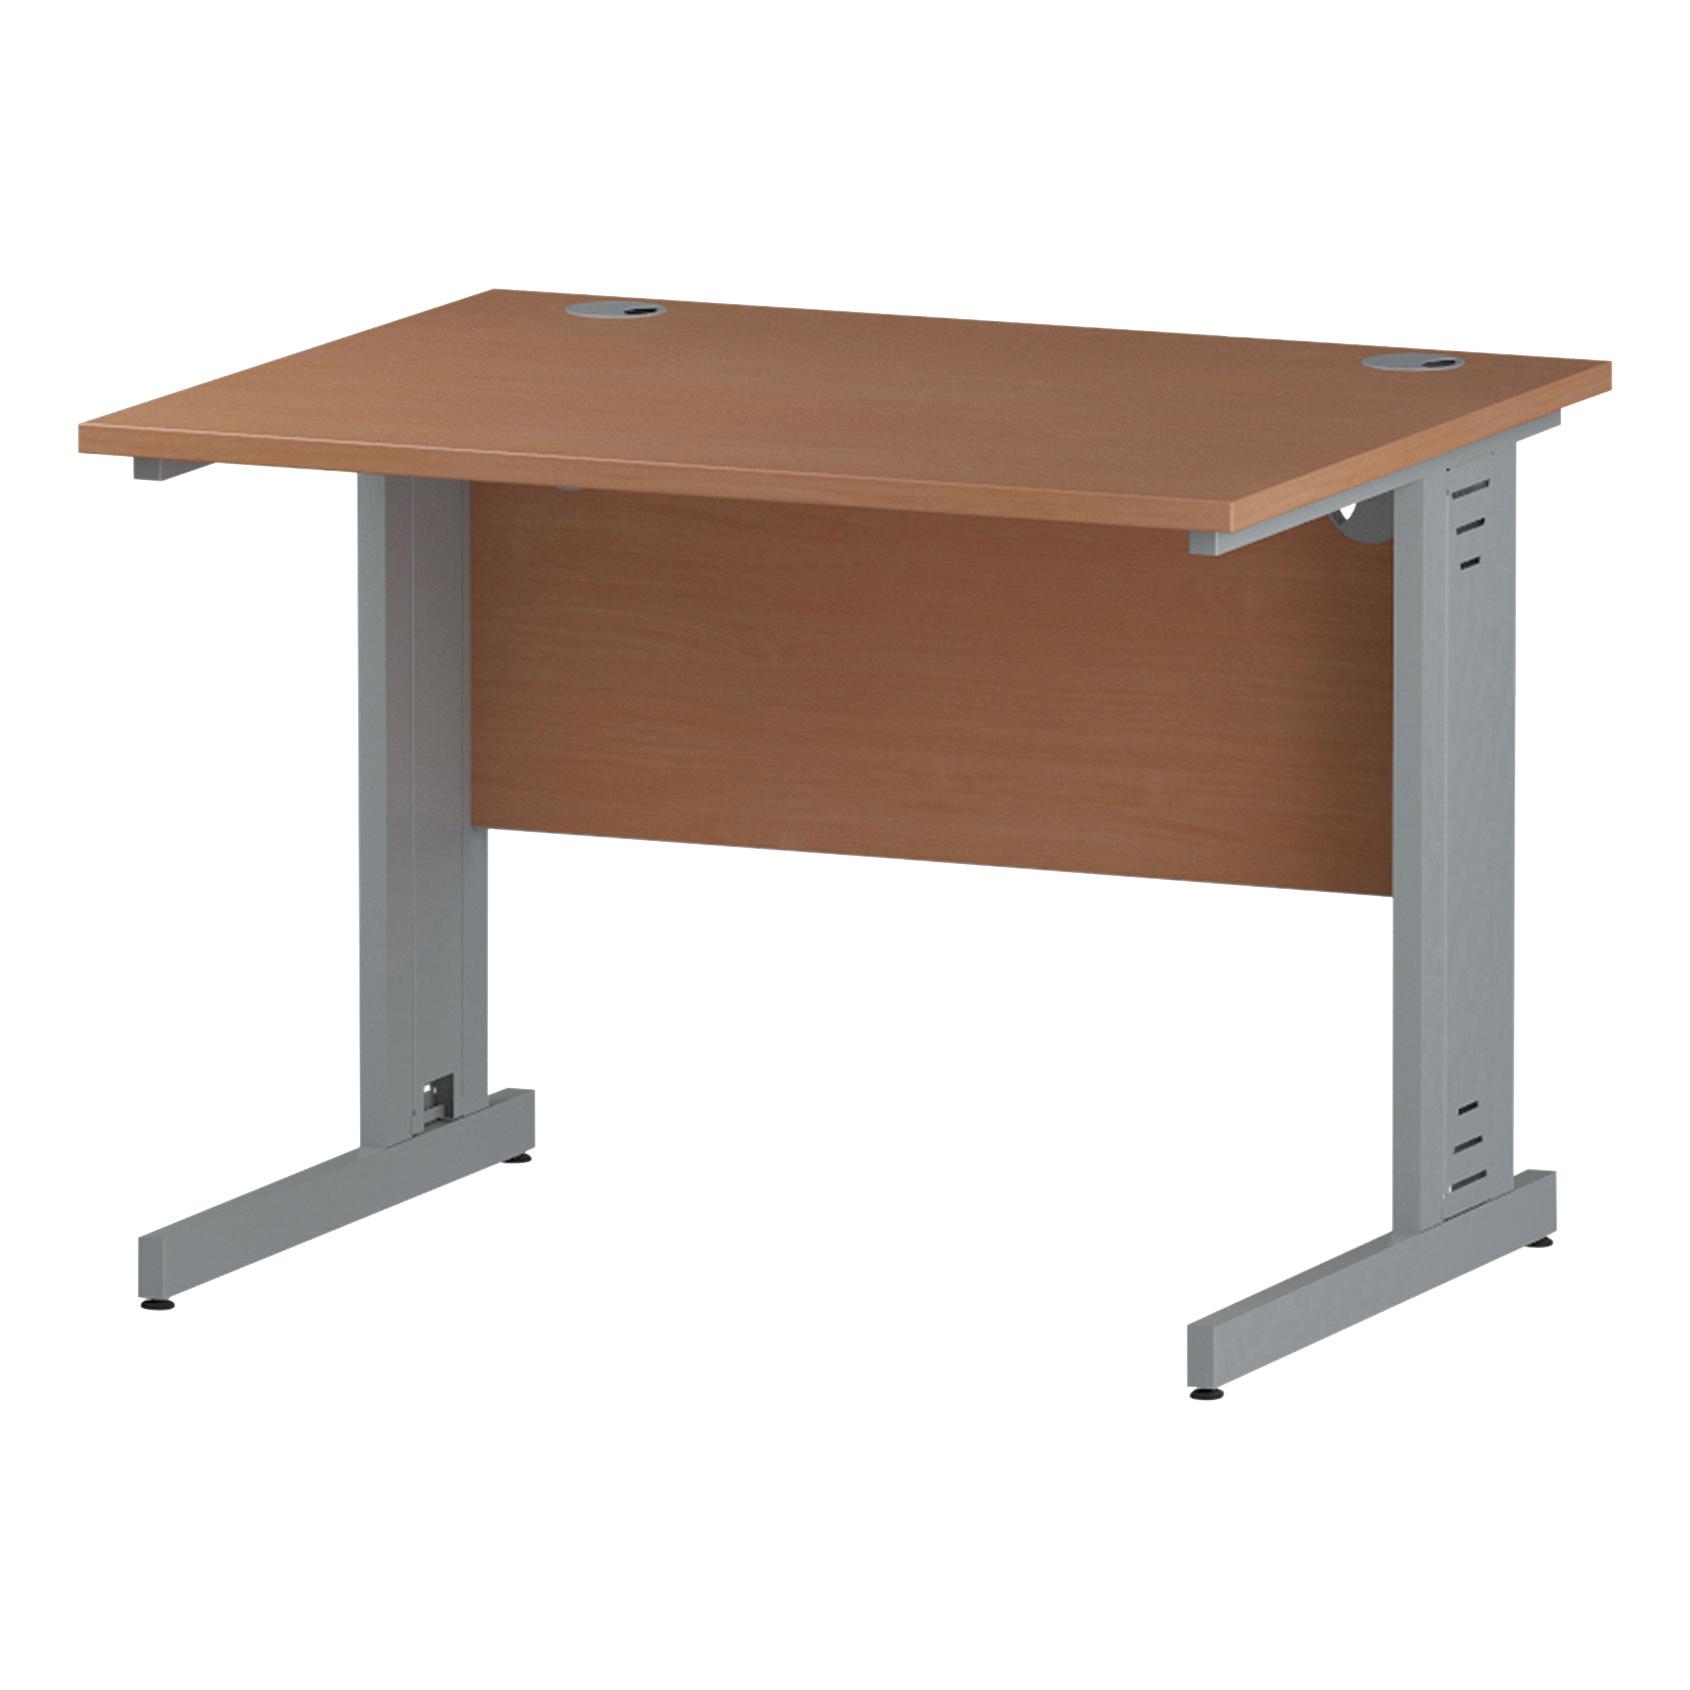 Trexus Rectangular Desk Silver Cable Managed Leg 1000x800mm Beech Ref I000458